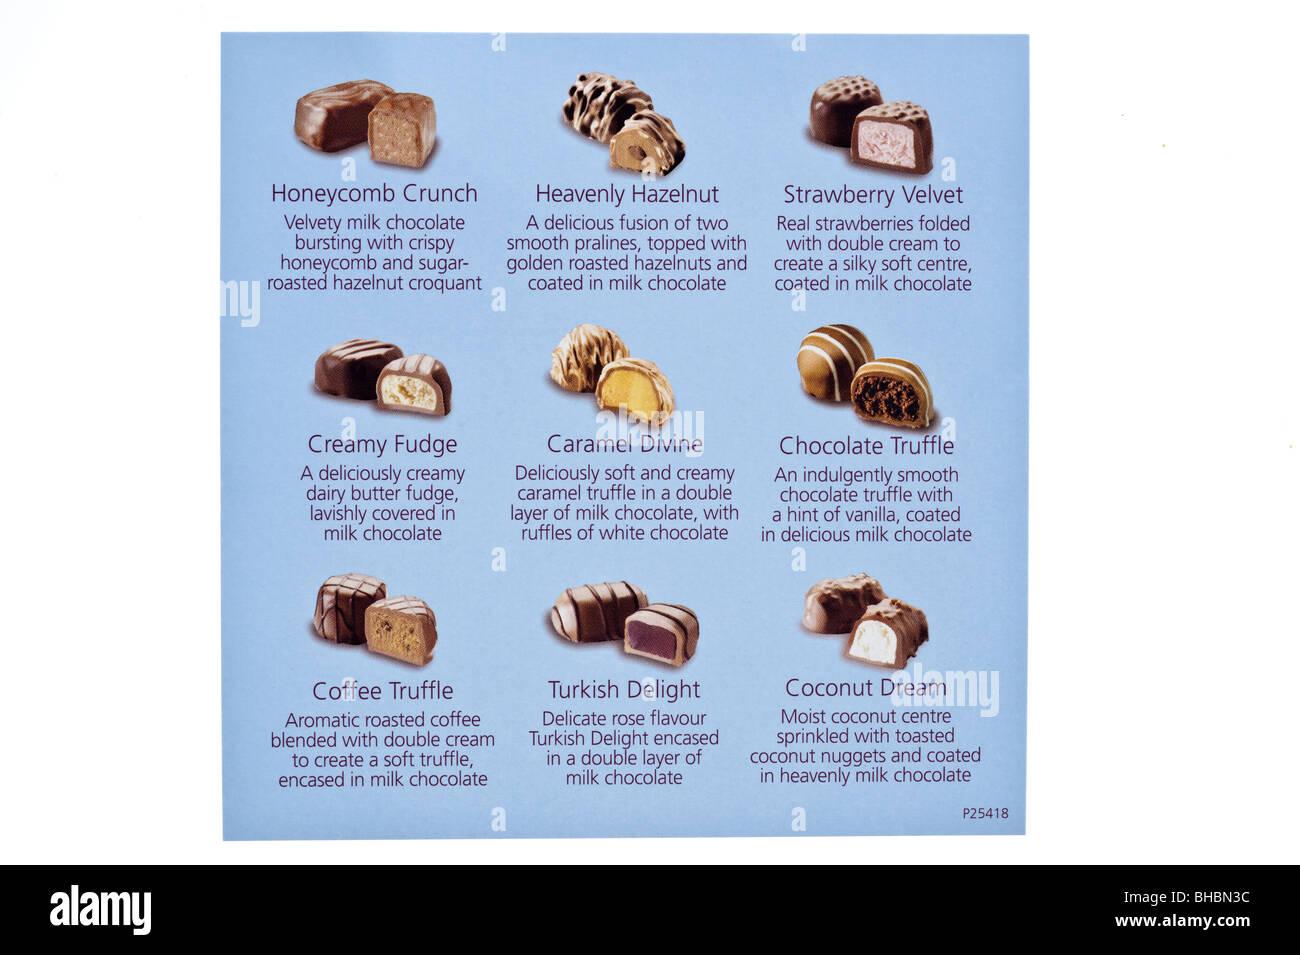 Chocolate selection description information chart - Stock Image